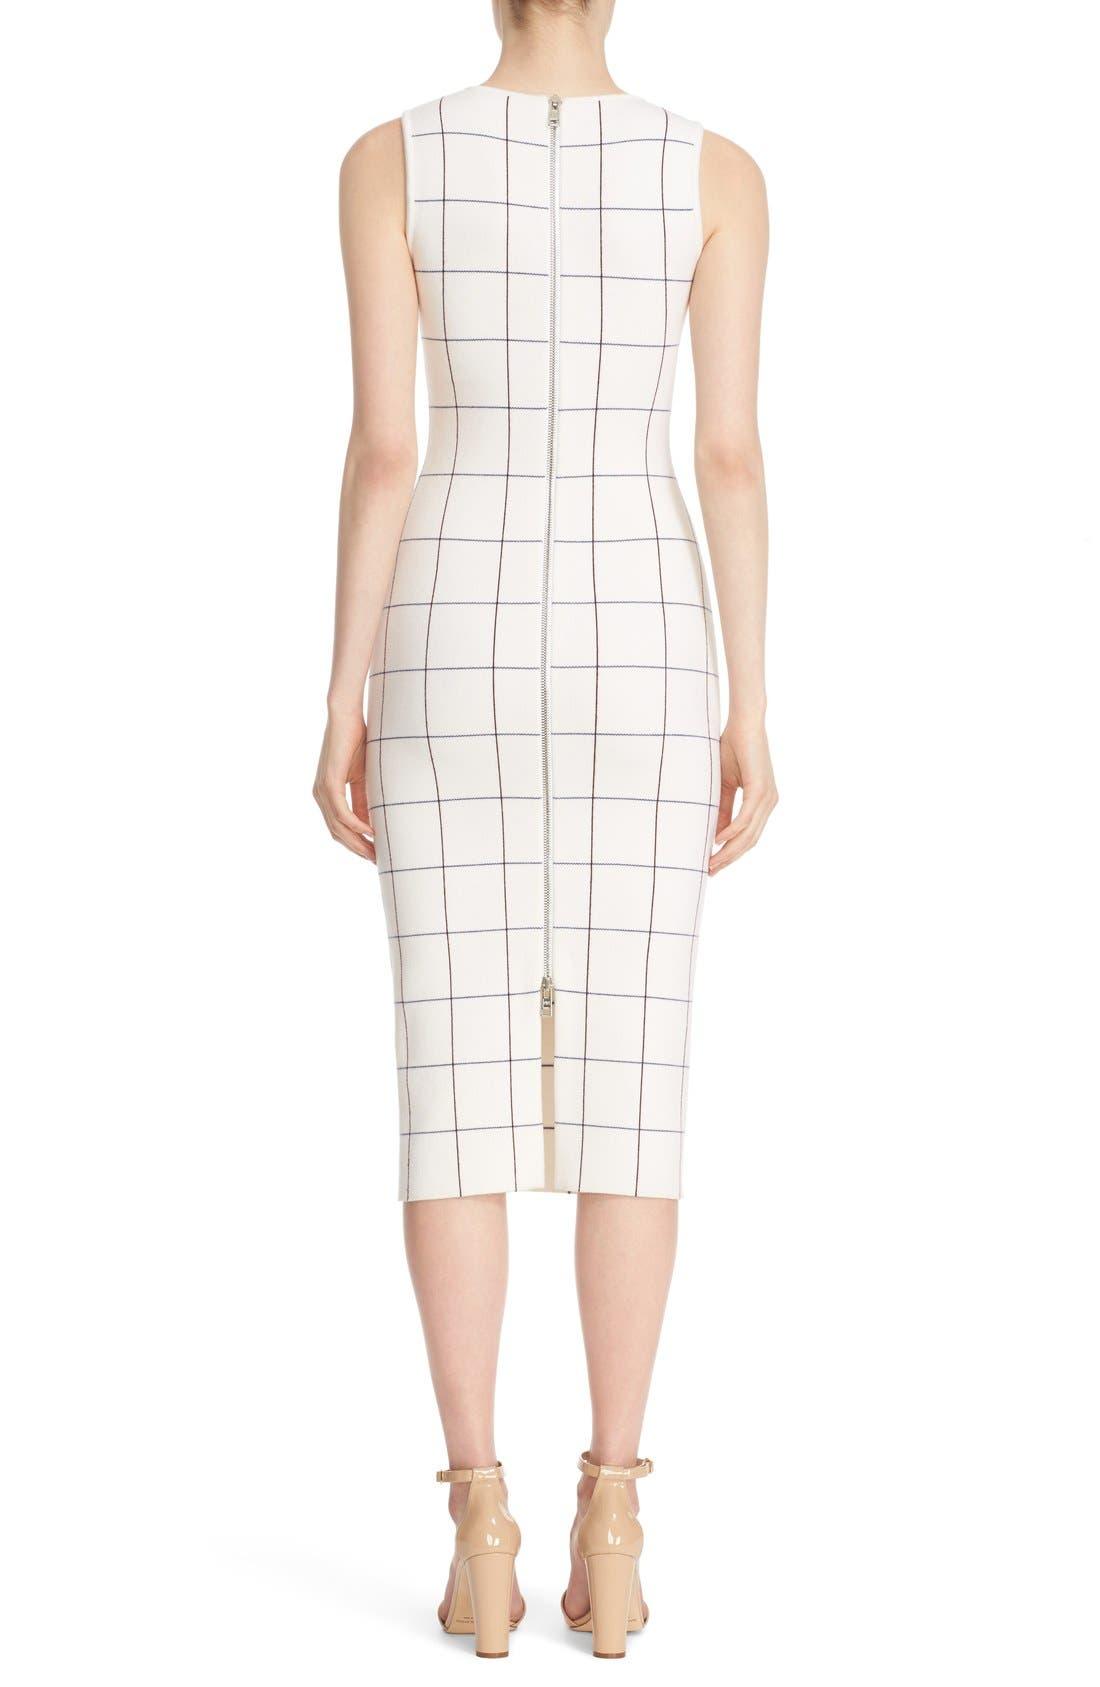 Victoria Beckham Intarsia Check Sheath Dress,                             Alternate thumbnail 2, color,                             100